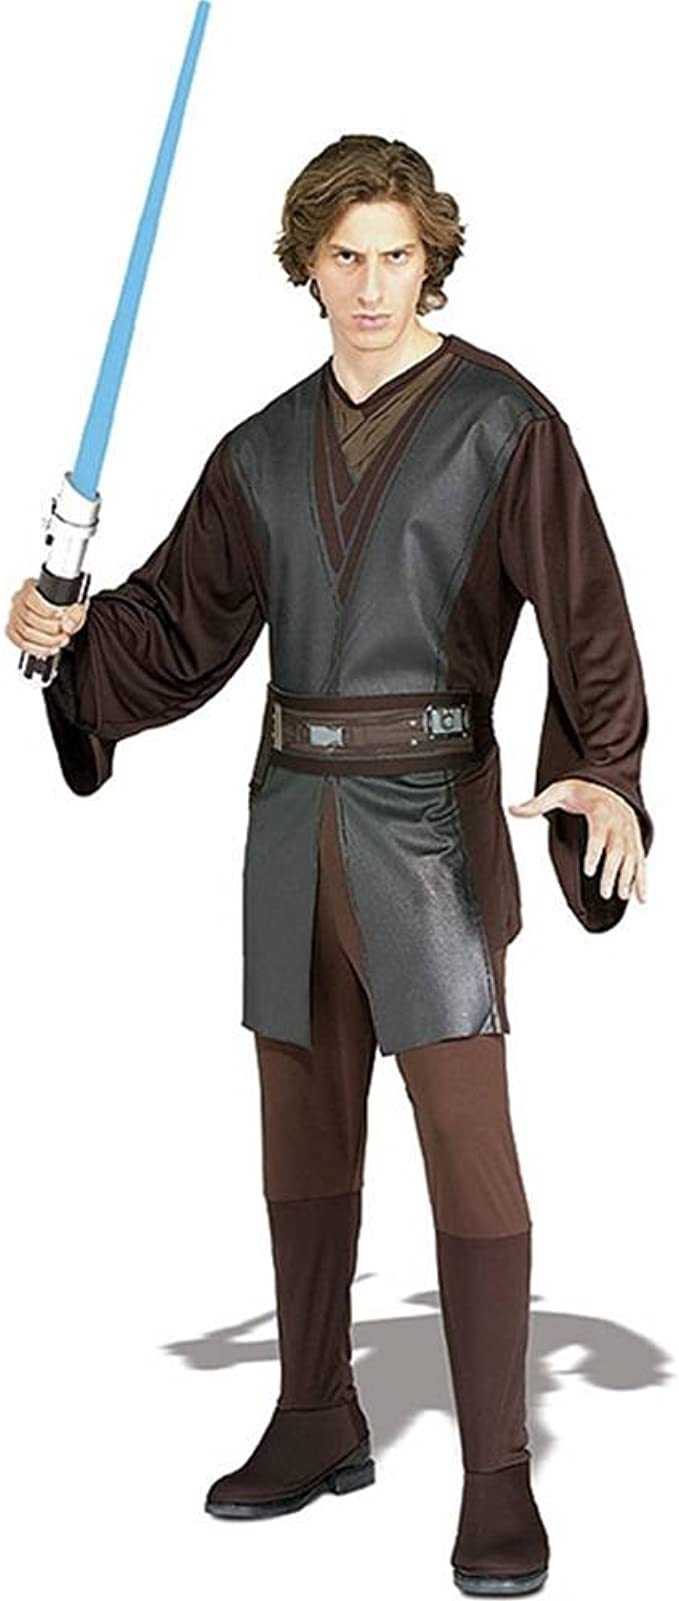 Amazon.com: Rubies Costume CO. Inc, disfraz de Anakin ...